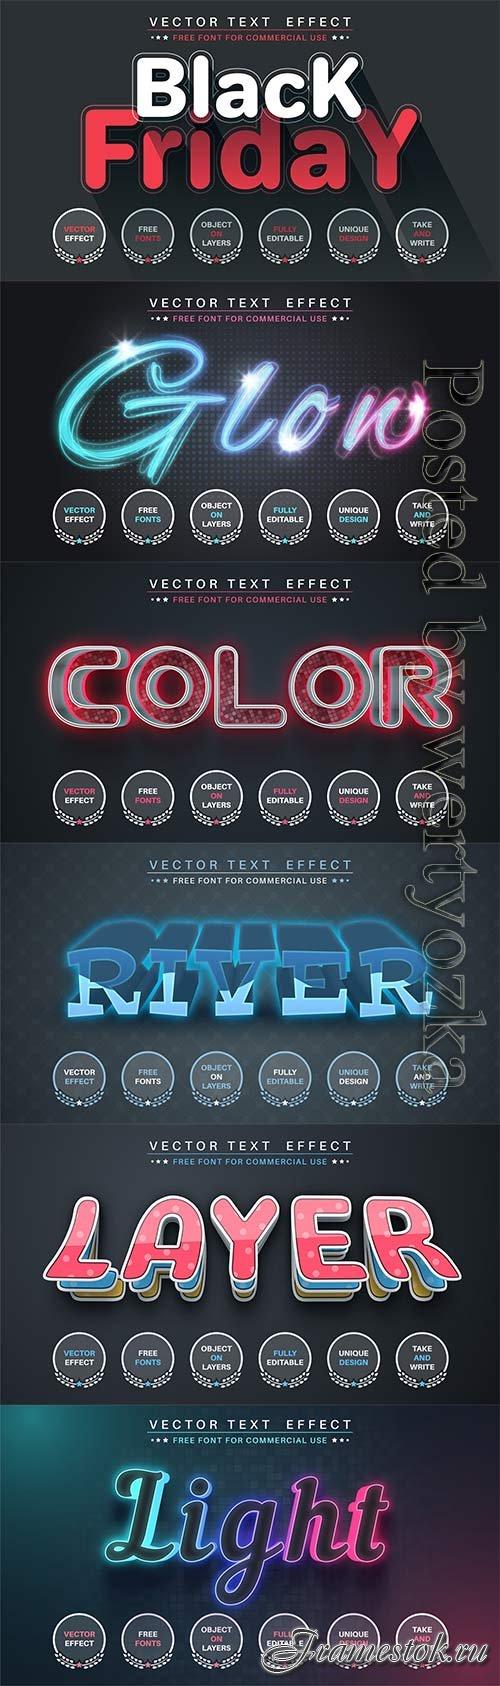 3d editable text style effect vector vol 753